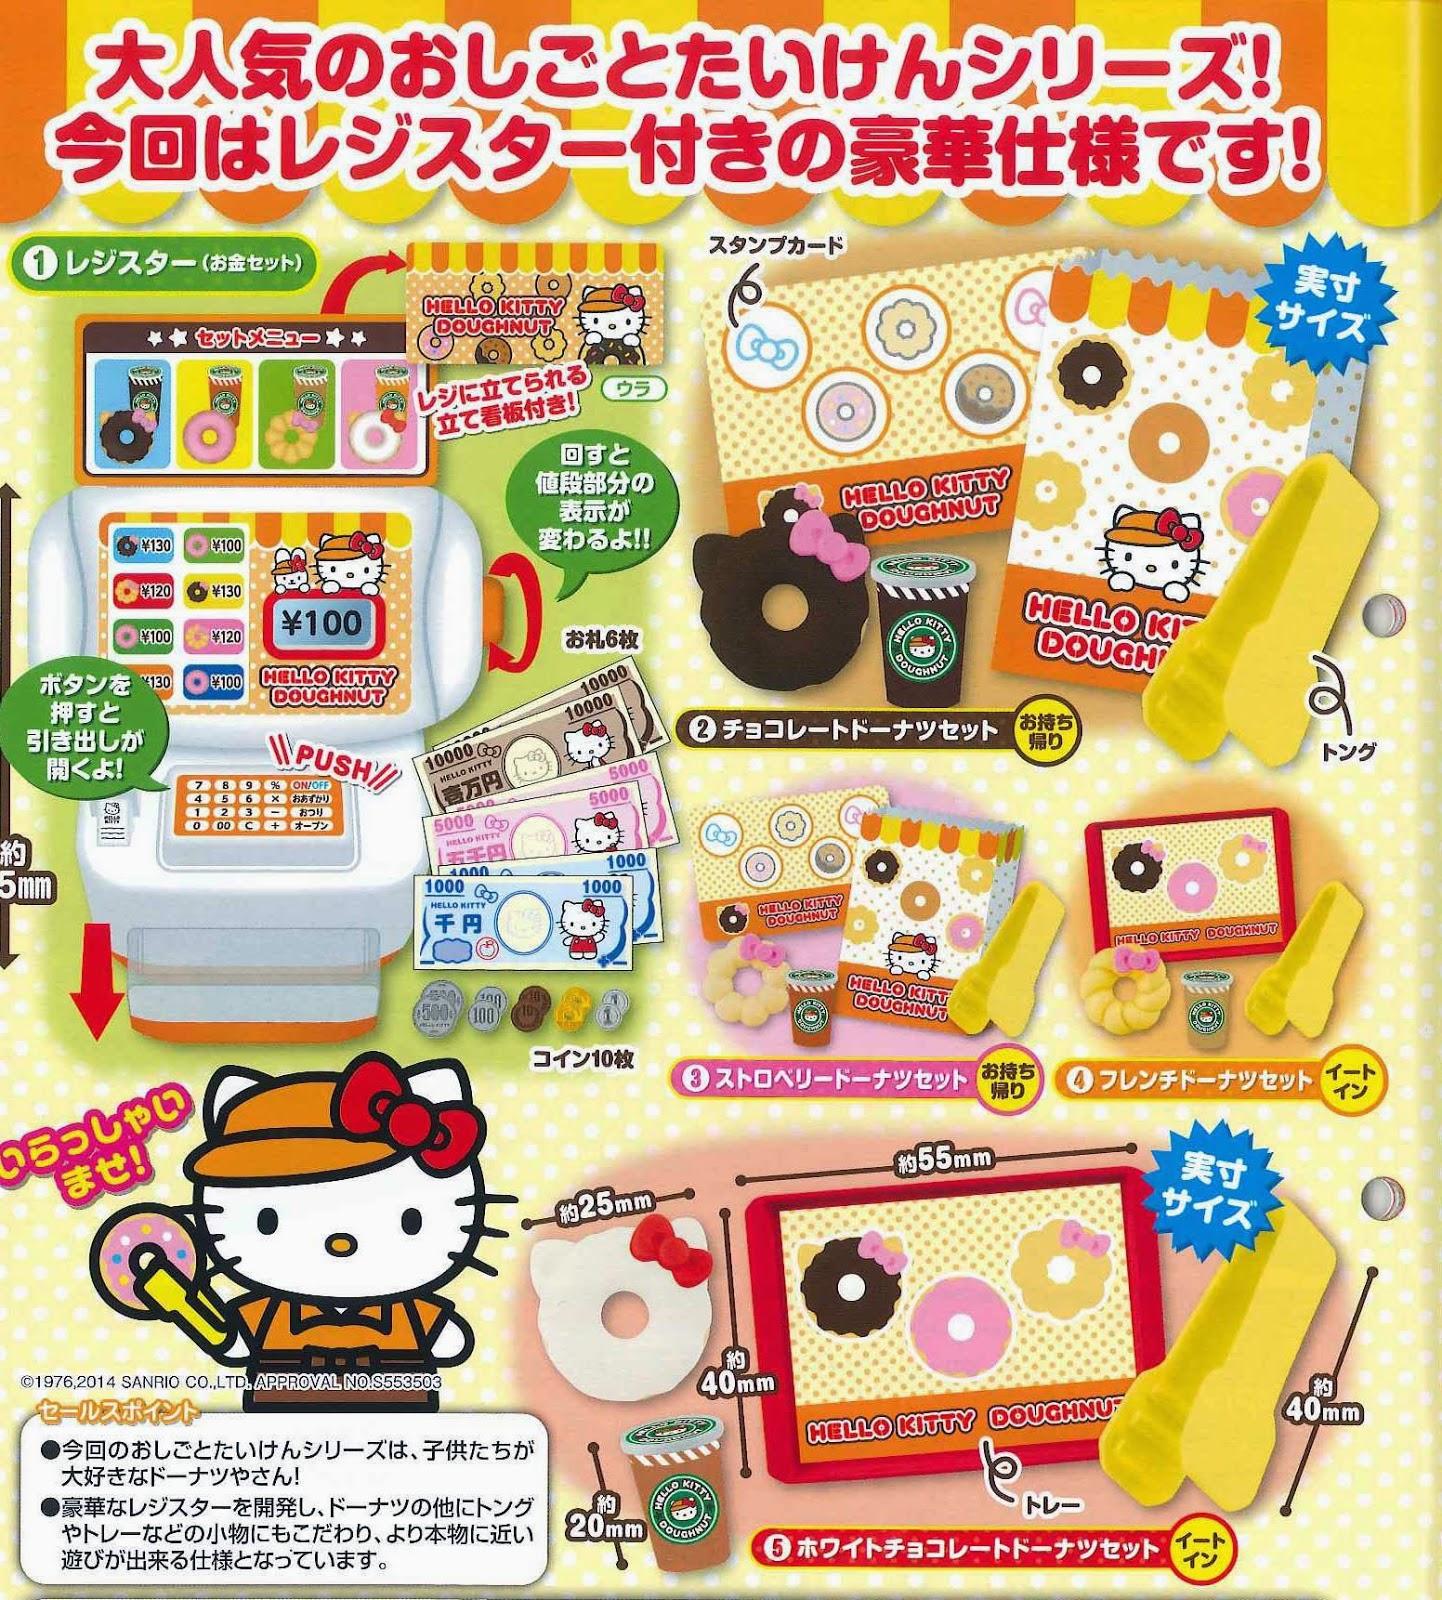 Takara Tomy Dollhouse Miniature Hello Kitty Oshigototanken Donut